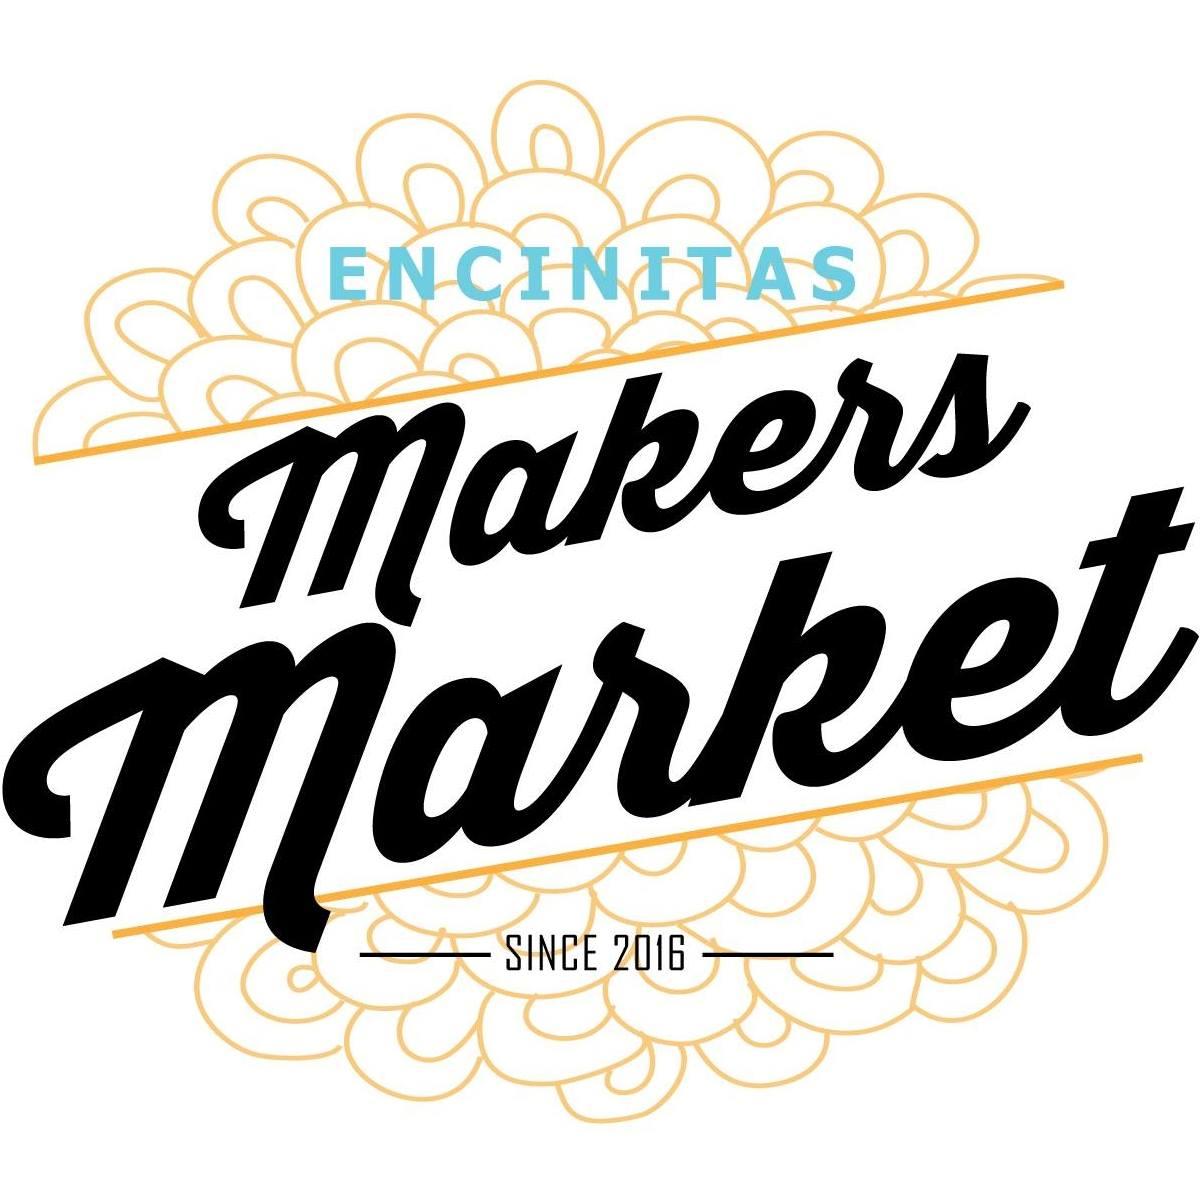 https://encinitasmakersmarket.com/